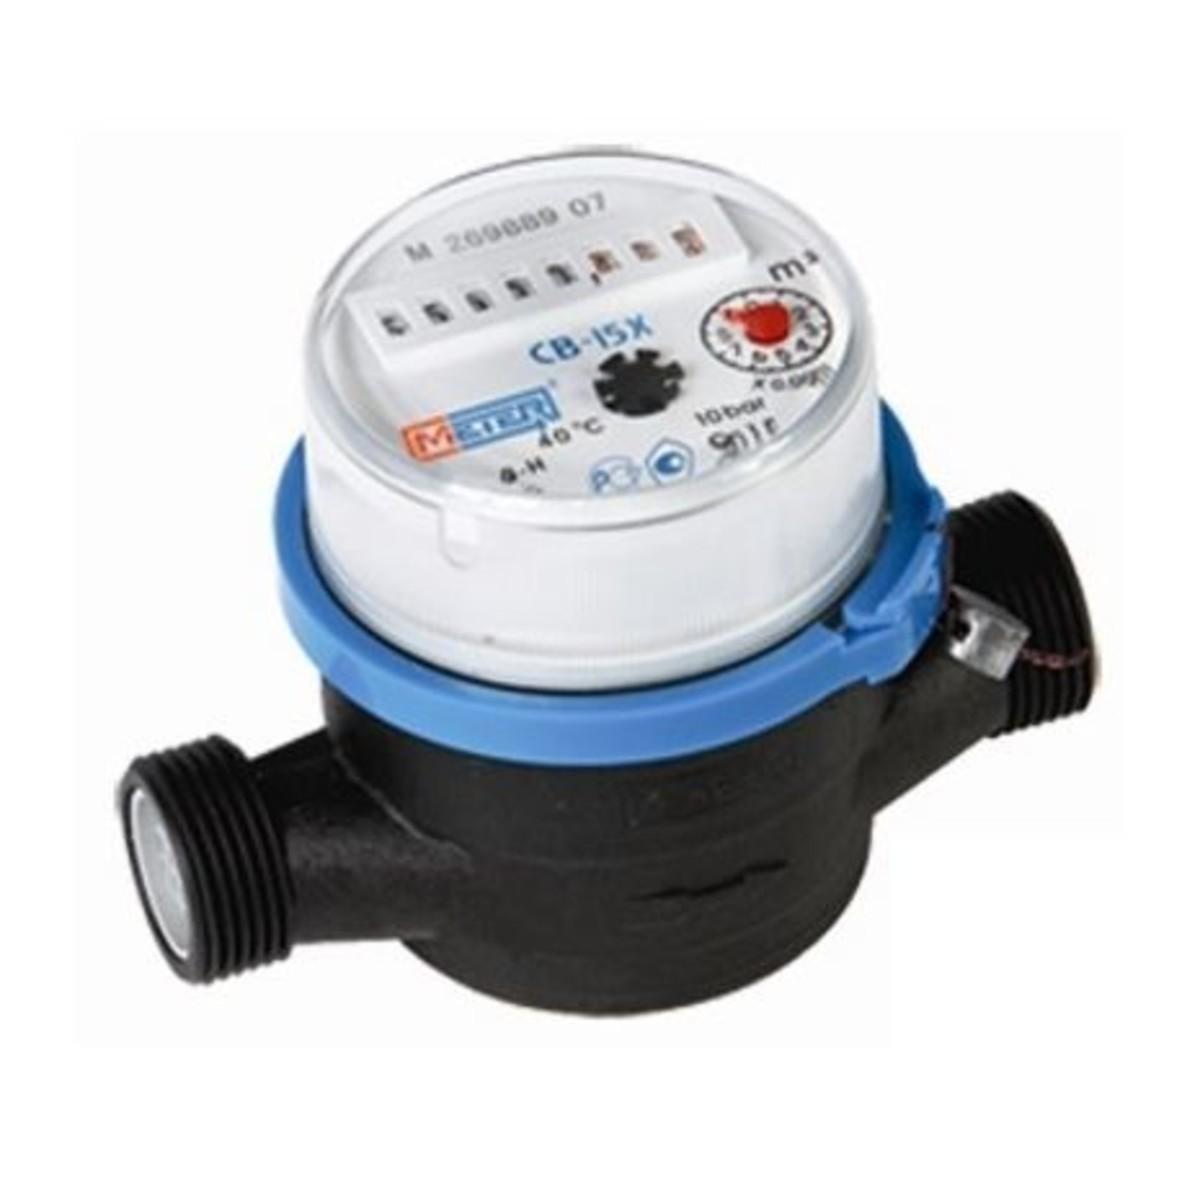 Счетчик воды Метер СВ-15 полимер 110 мм